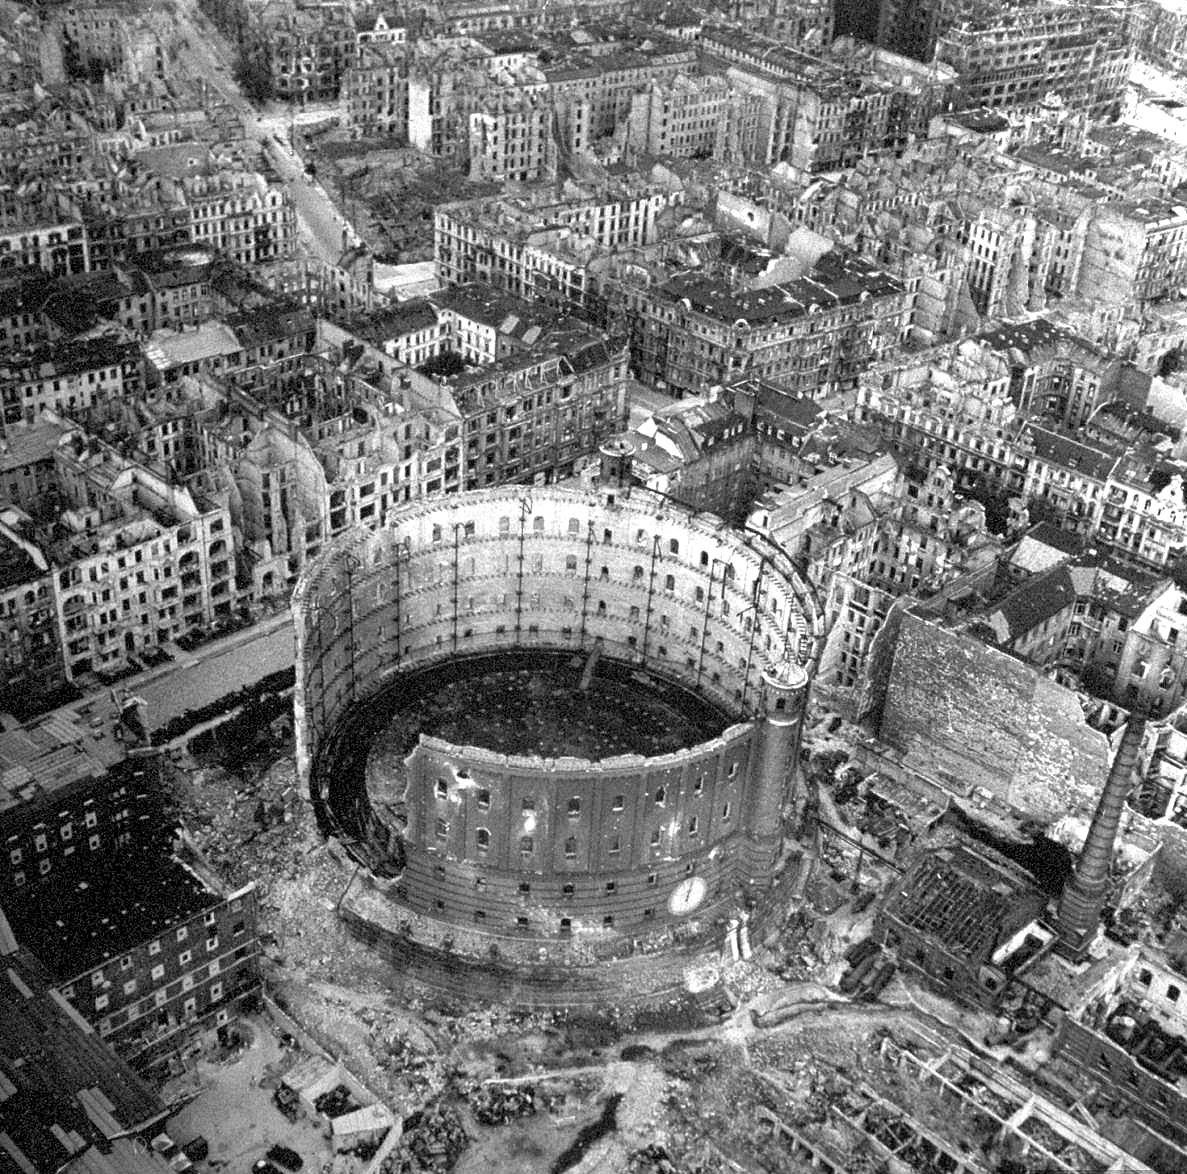 معركة سقوط برلين 1945  Ccg_Hb9XEAM2Goq